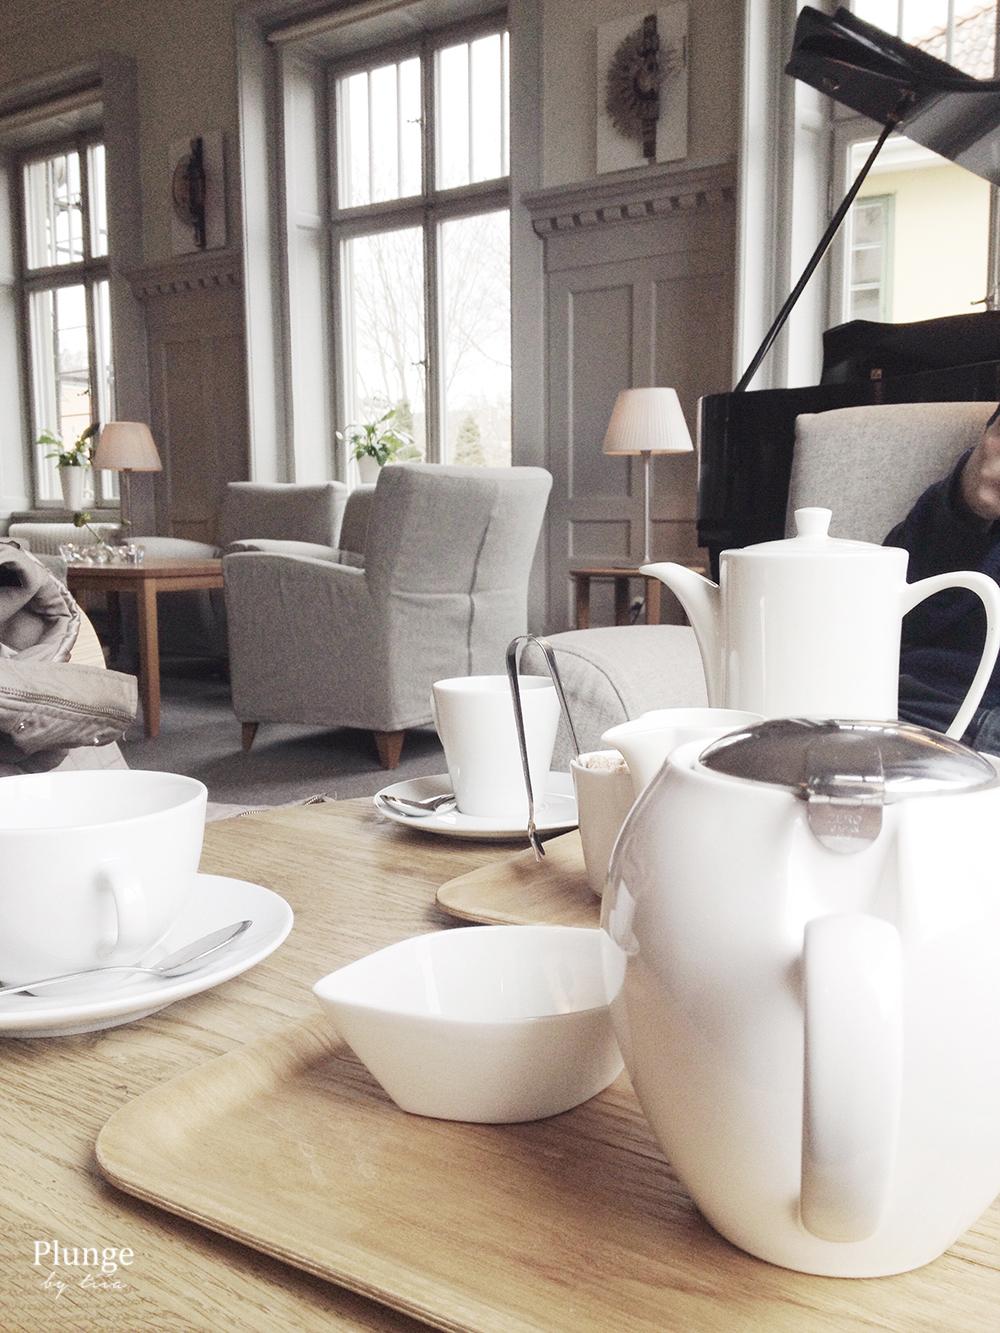 Teatime in Sigtuna Stadshotell